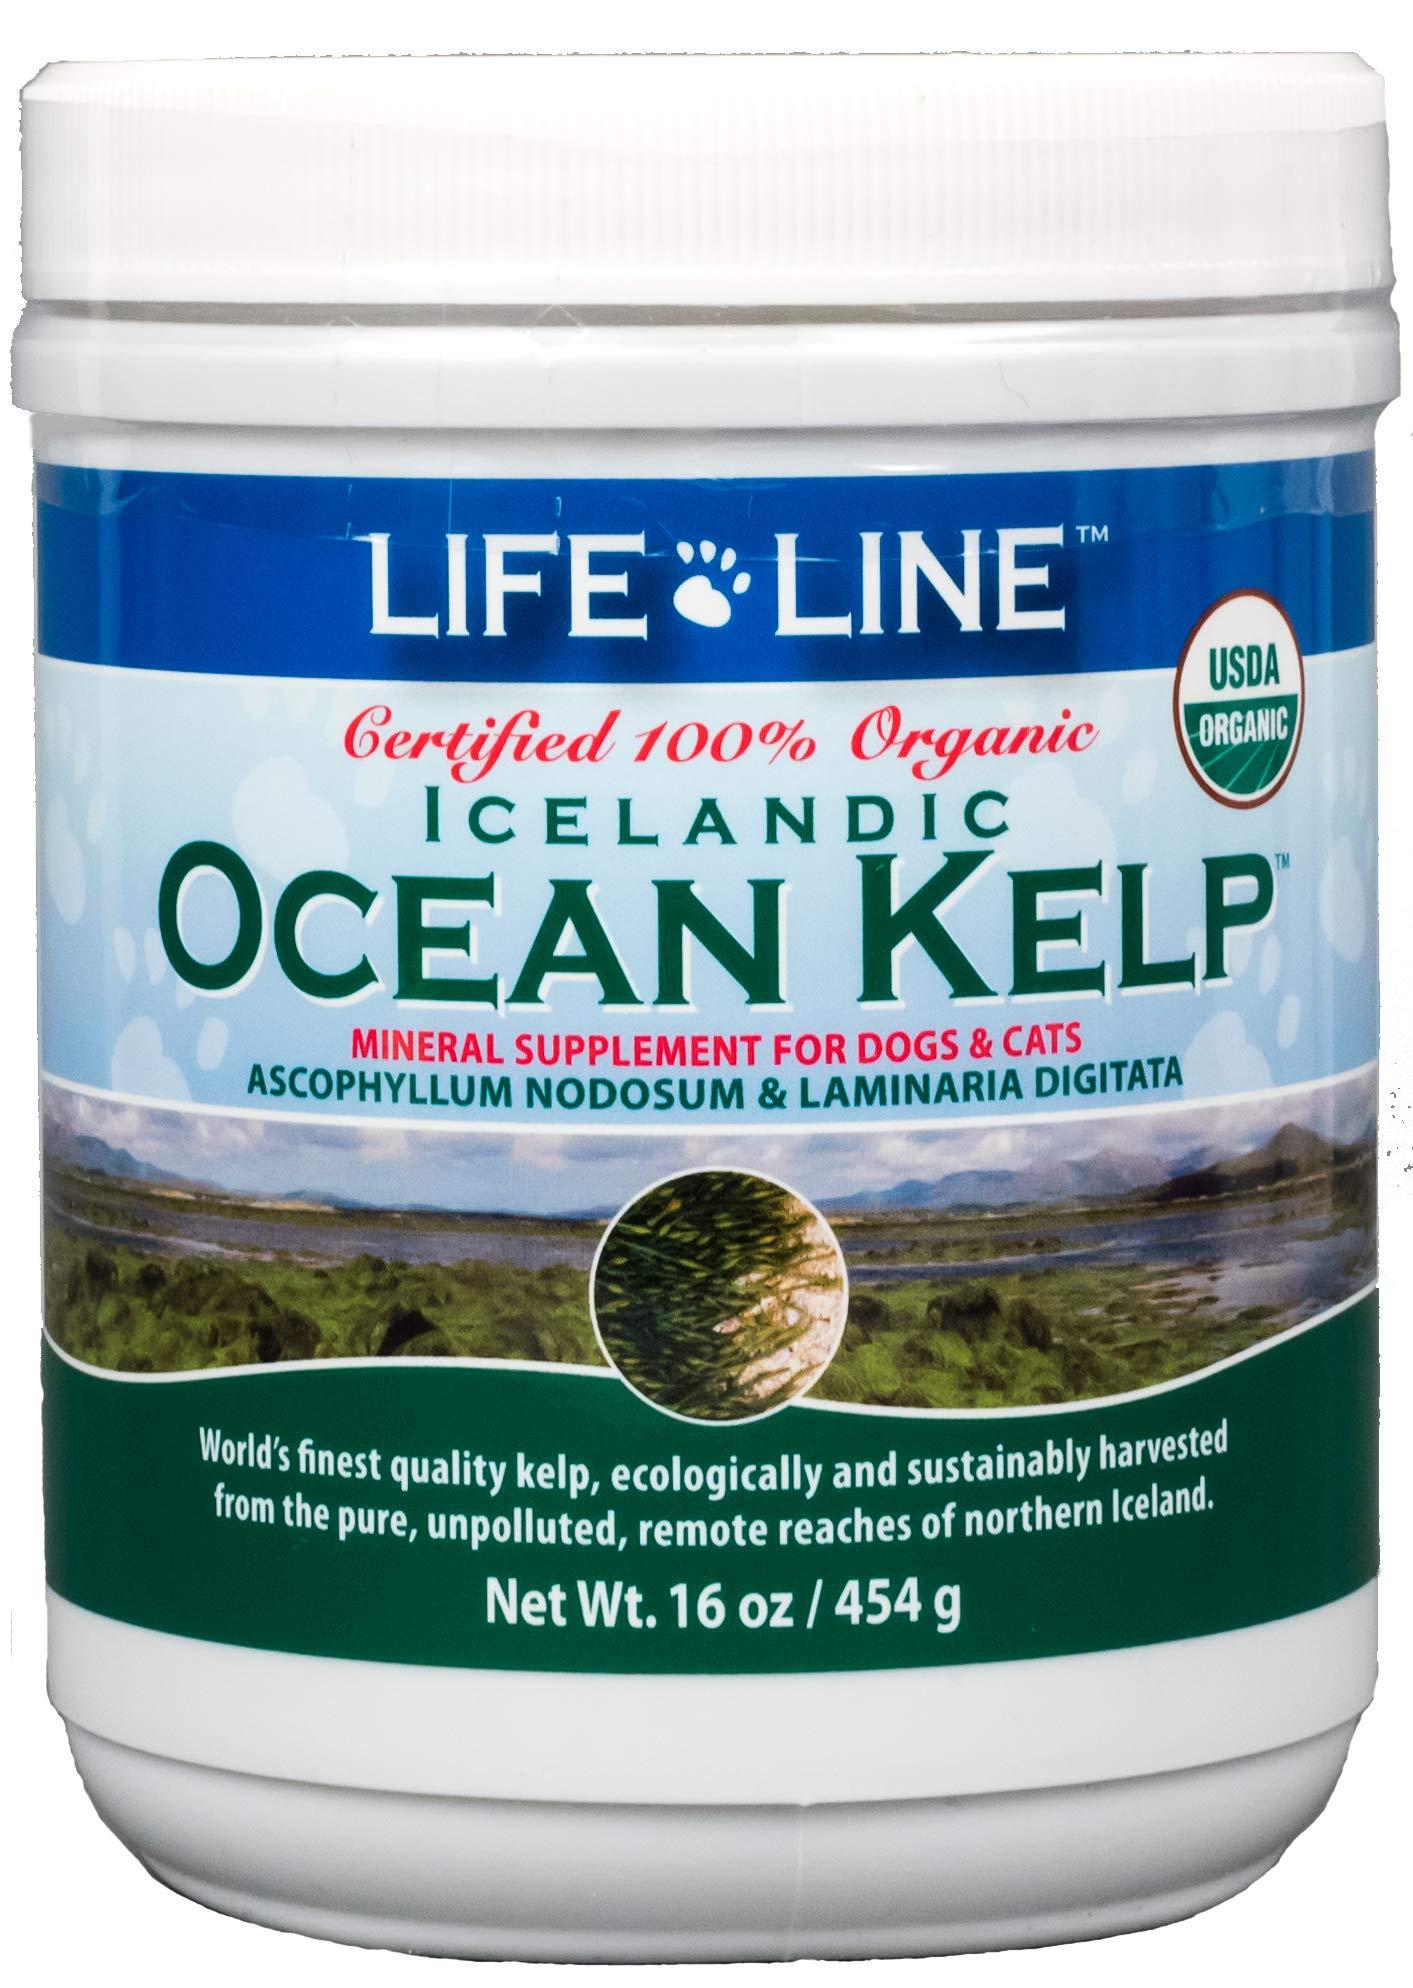 Life Line Pet Nutrition Organic Ocean Kelp Supplement for Skin & Coat, Digestion, Teeth & Gums in Dogs & Cats, 16 oz by Life Line Pet Nutrition